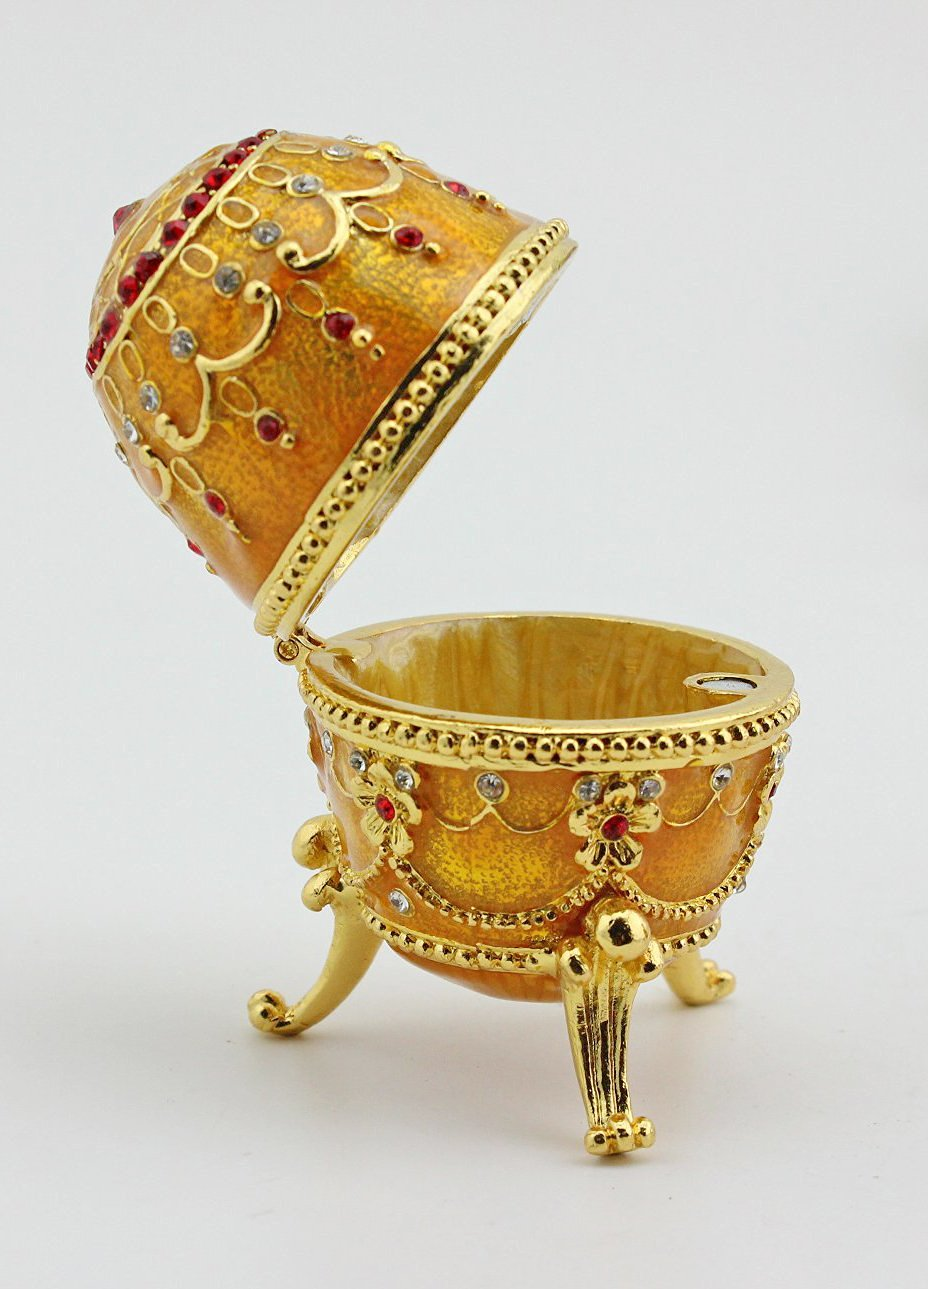 Easter Gifts Egg Faberge Trinket Box Jewelry Display Box Faberge Egg Box (Gold)